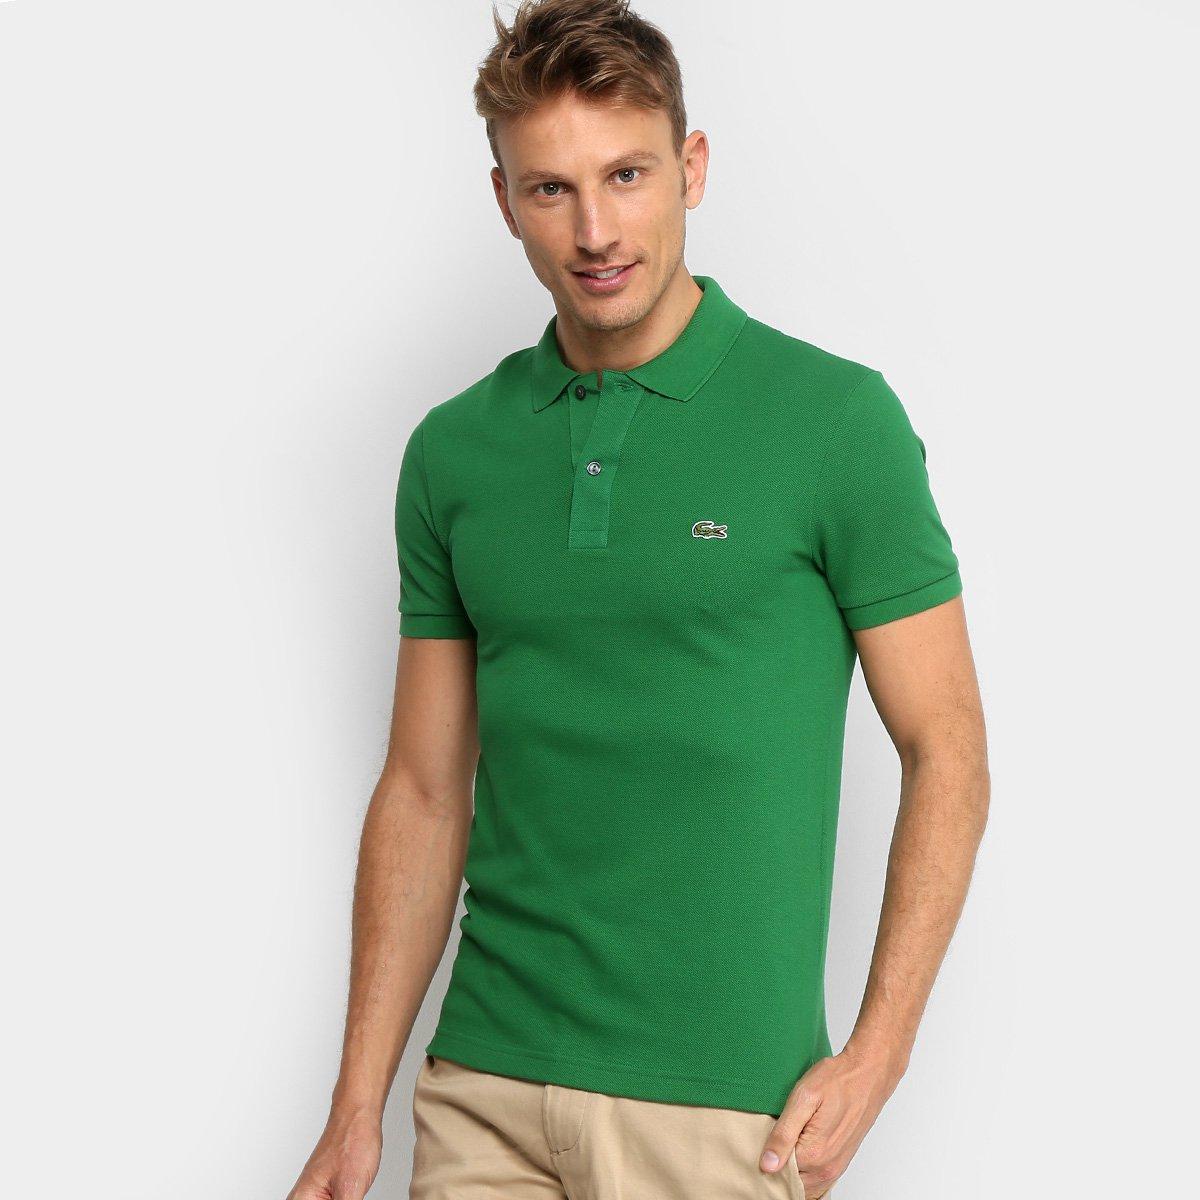 0da6d14f72d04 Camisa Polo Lacoste Piquet Slim Fit Masculina - Compre Agora